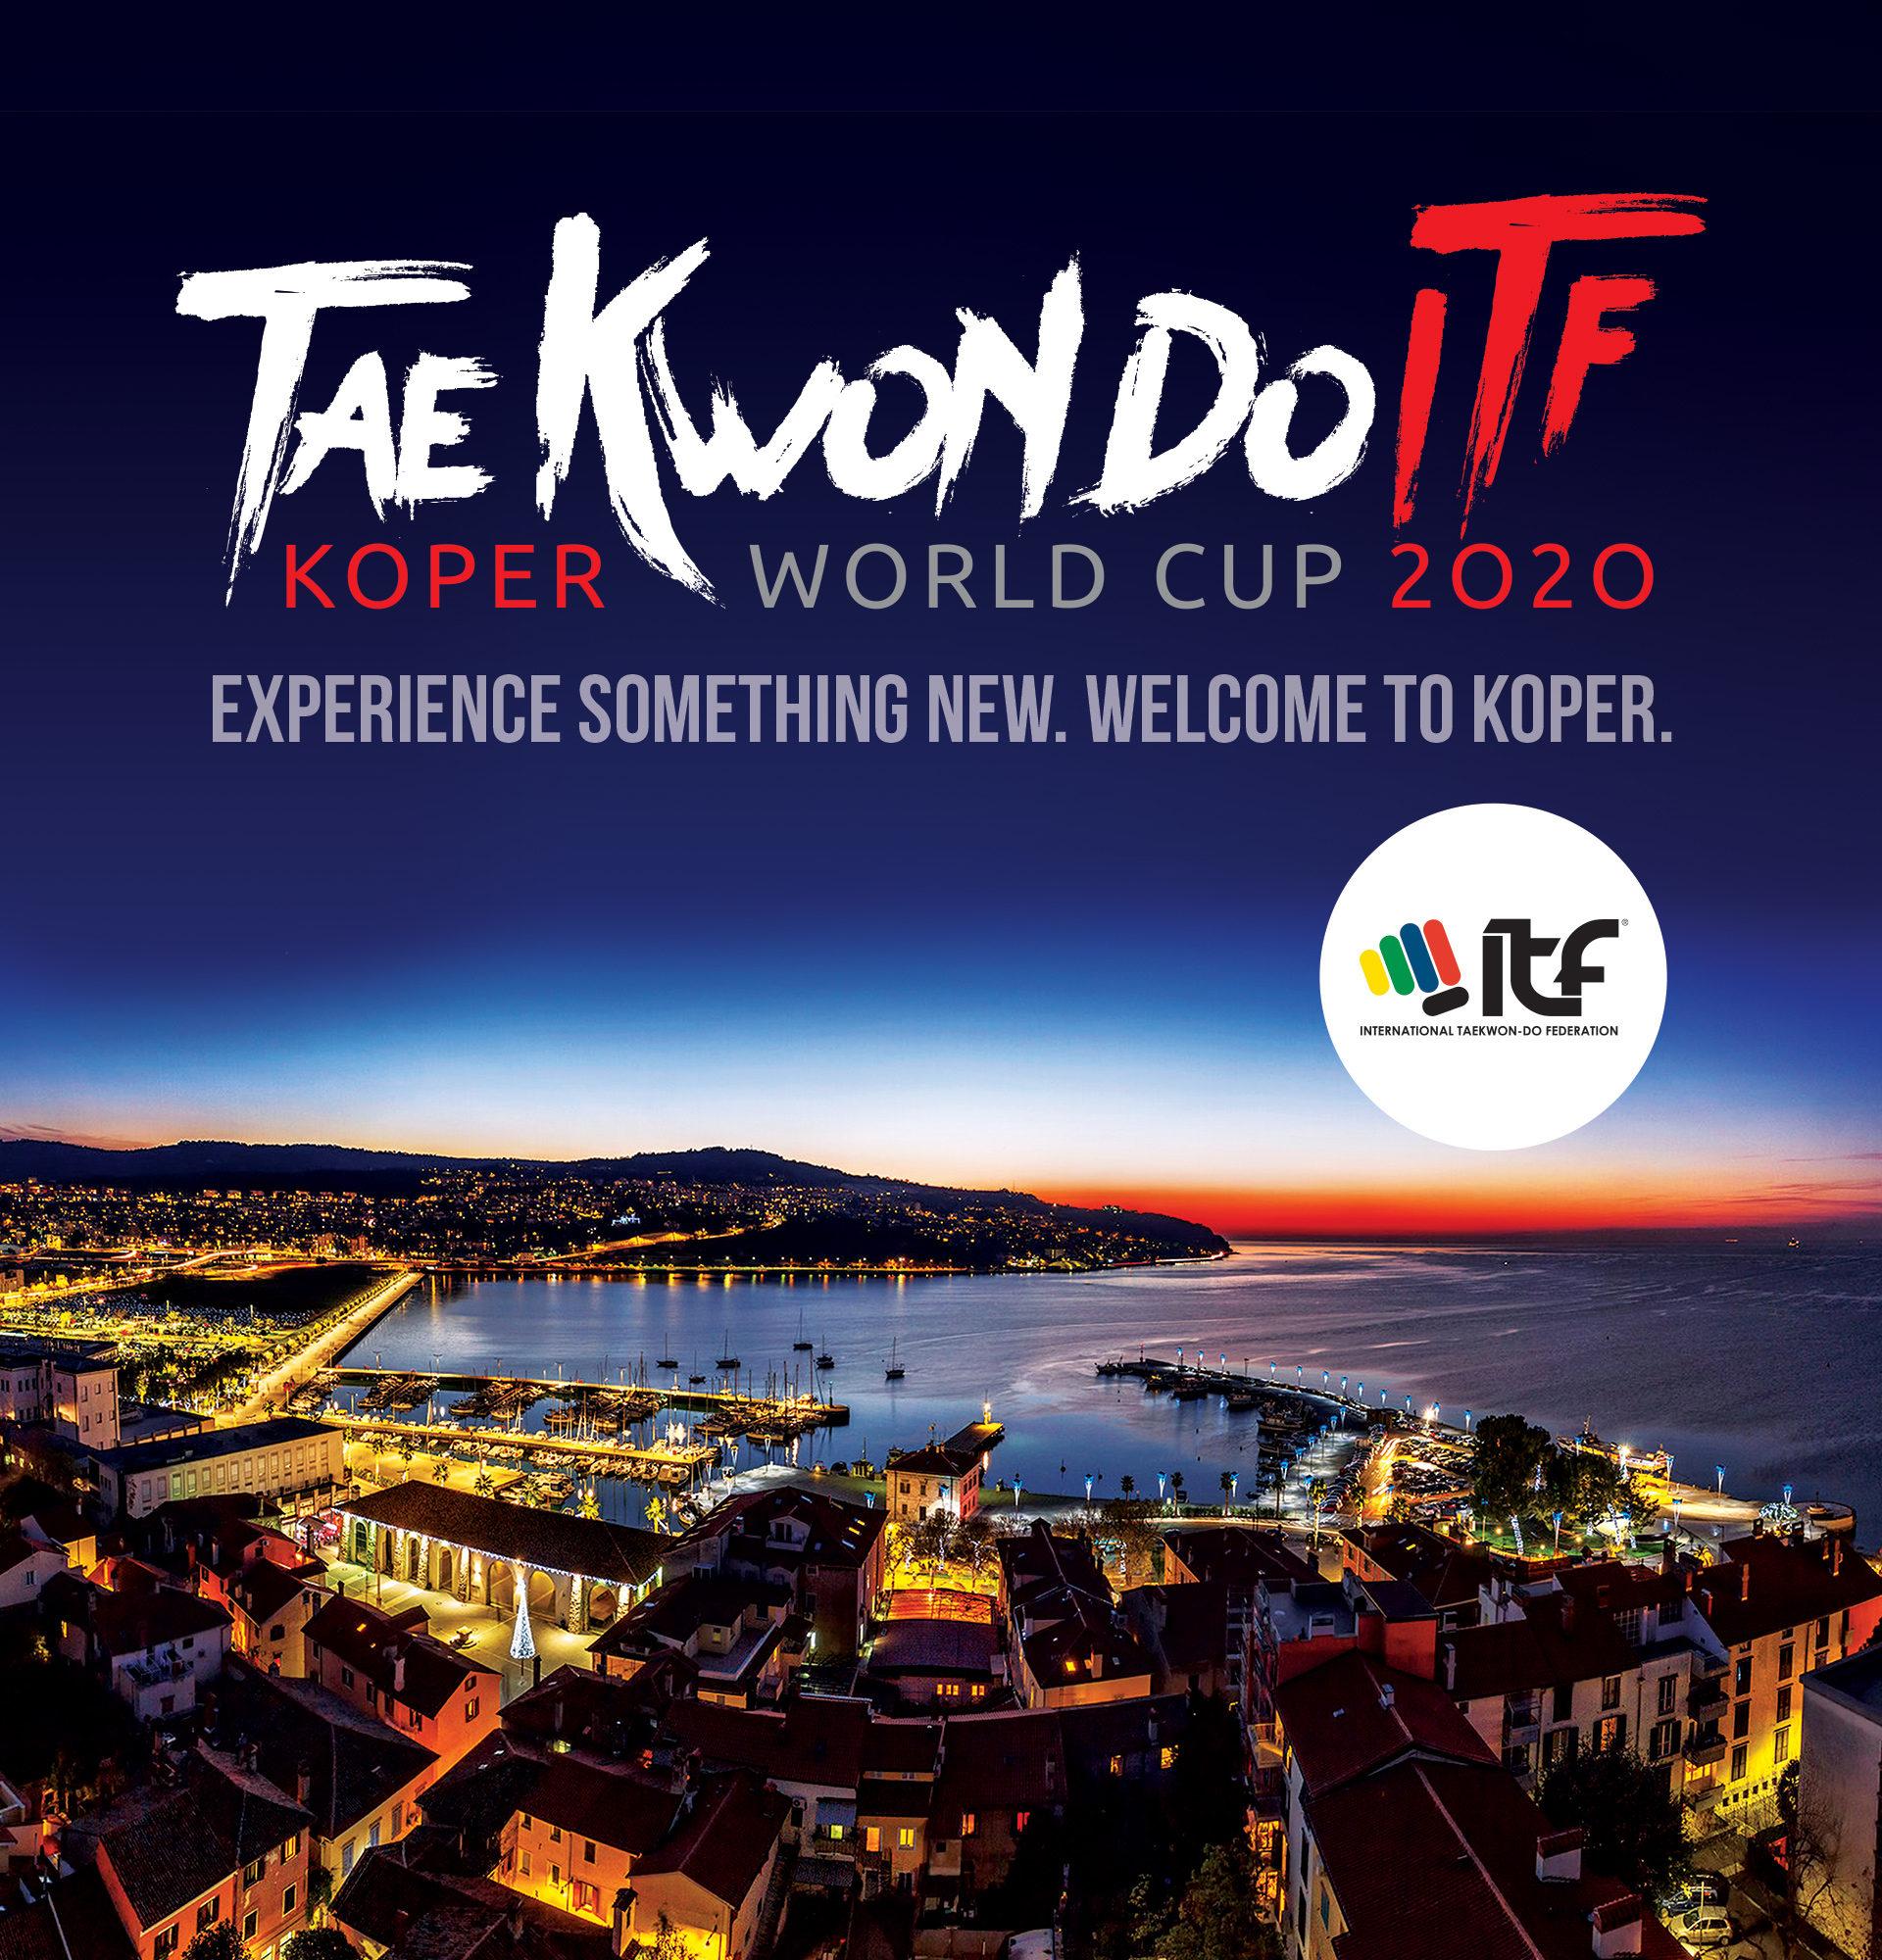 WORLD CUP 2020 TKD ITF<br> KOPER, SLOVENIA <br> POSPOSTO A OTTOBRE 2022